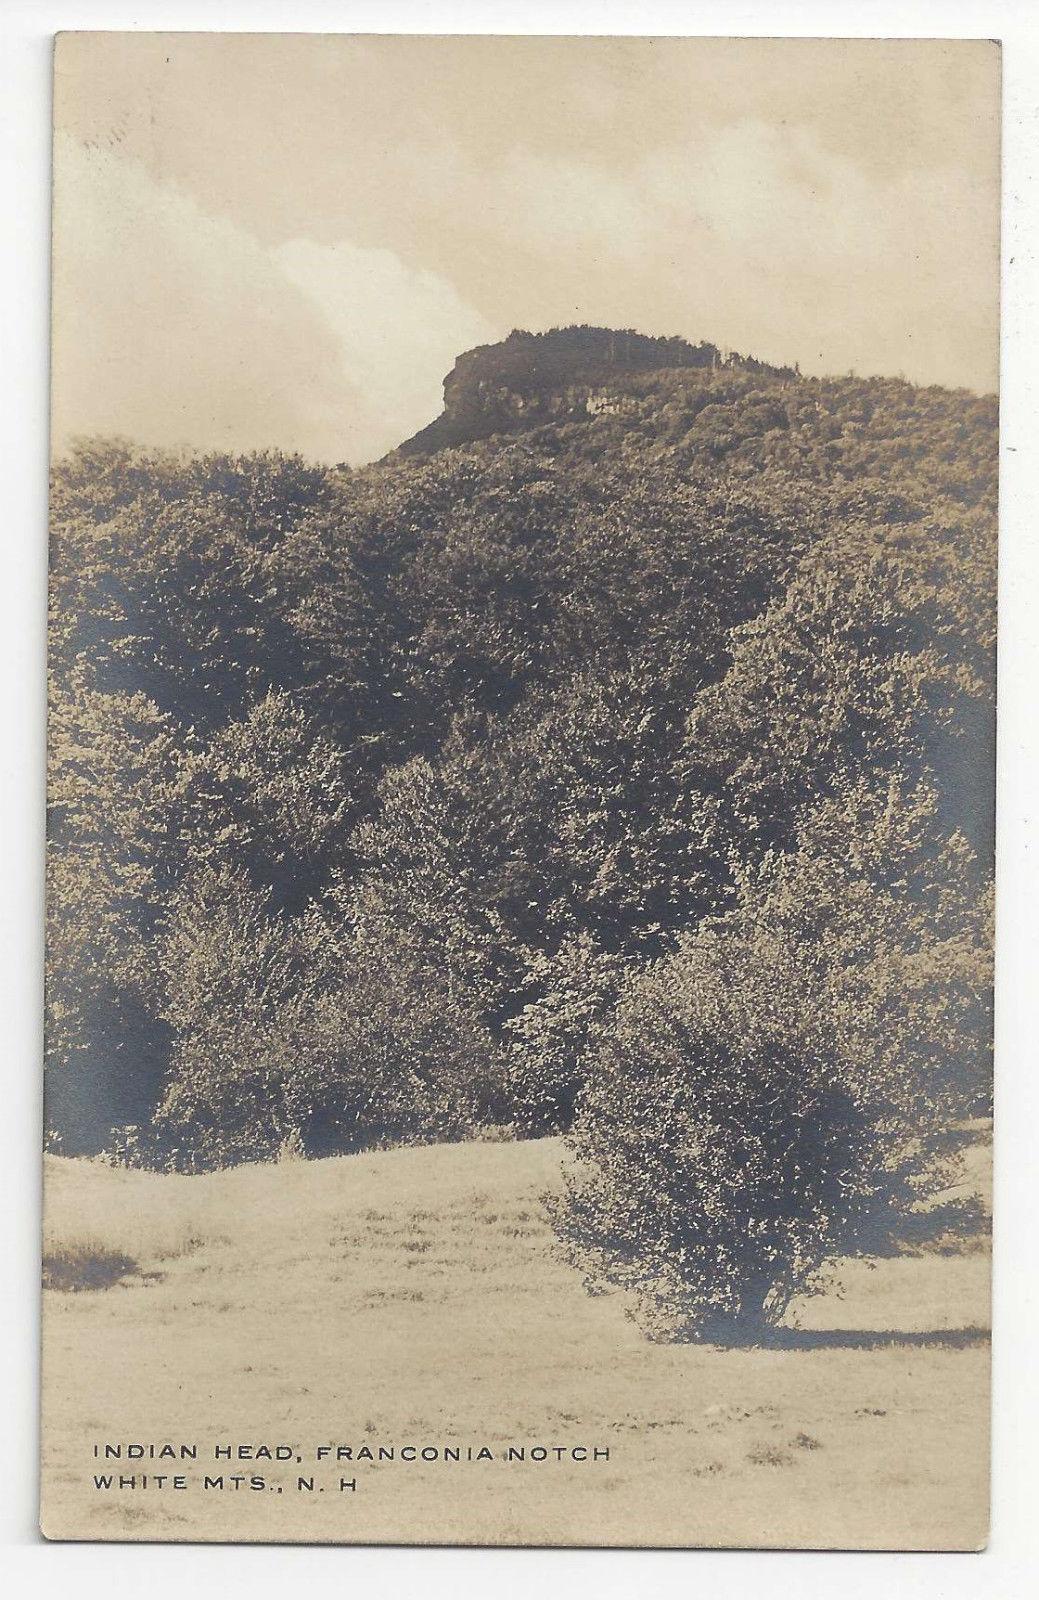 NH RPPC Franconia Notch Indian Head White Mountain Vtg Real Photo Postcard